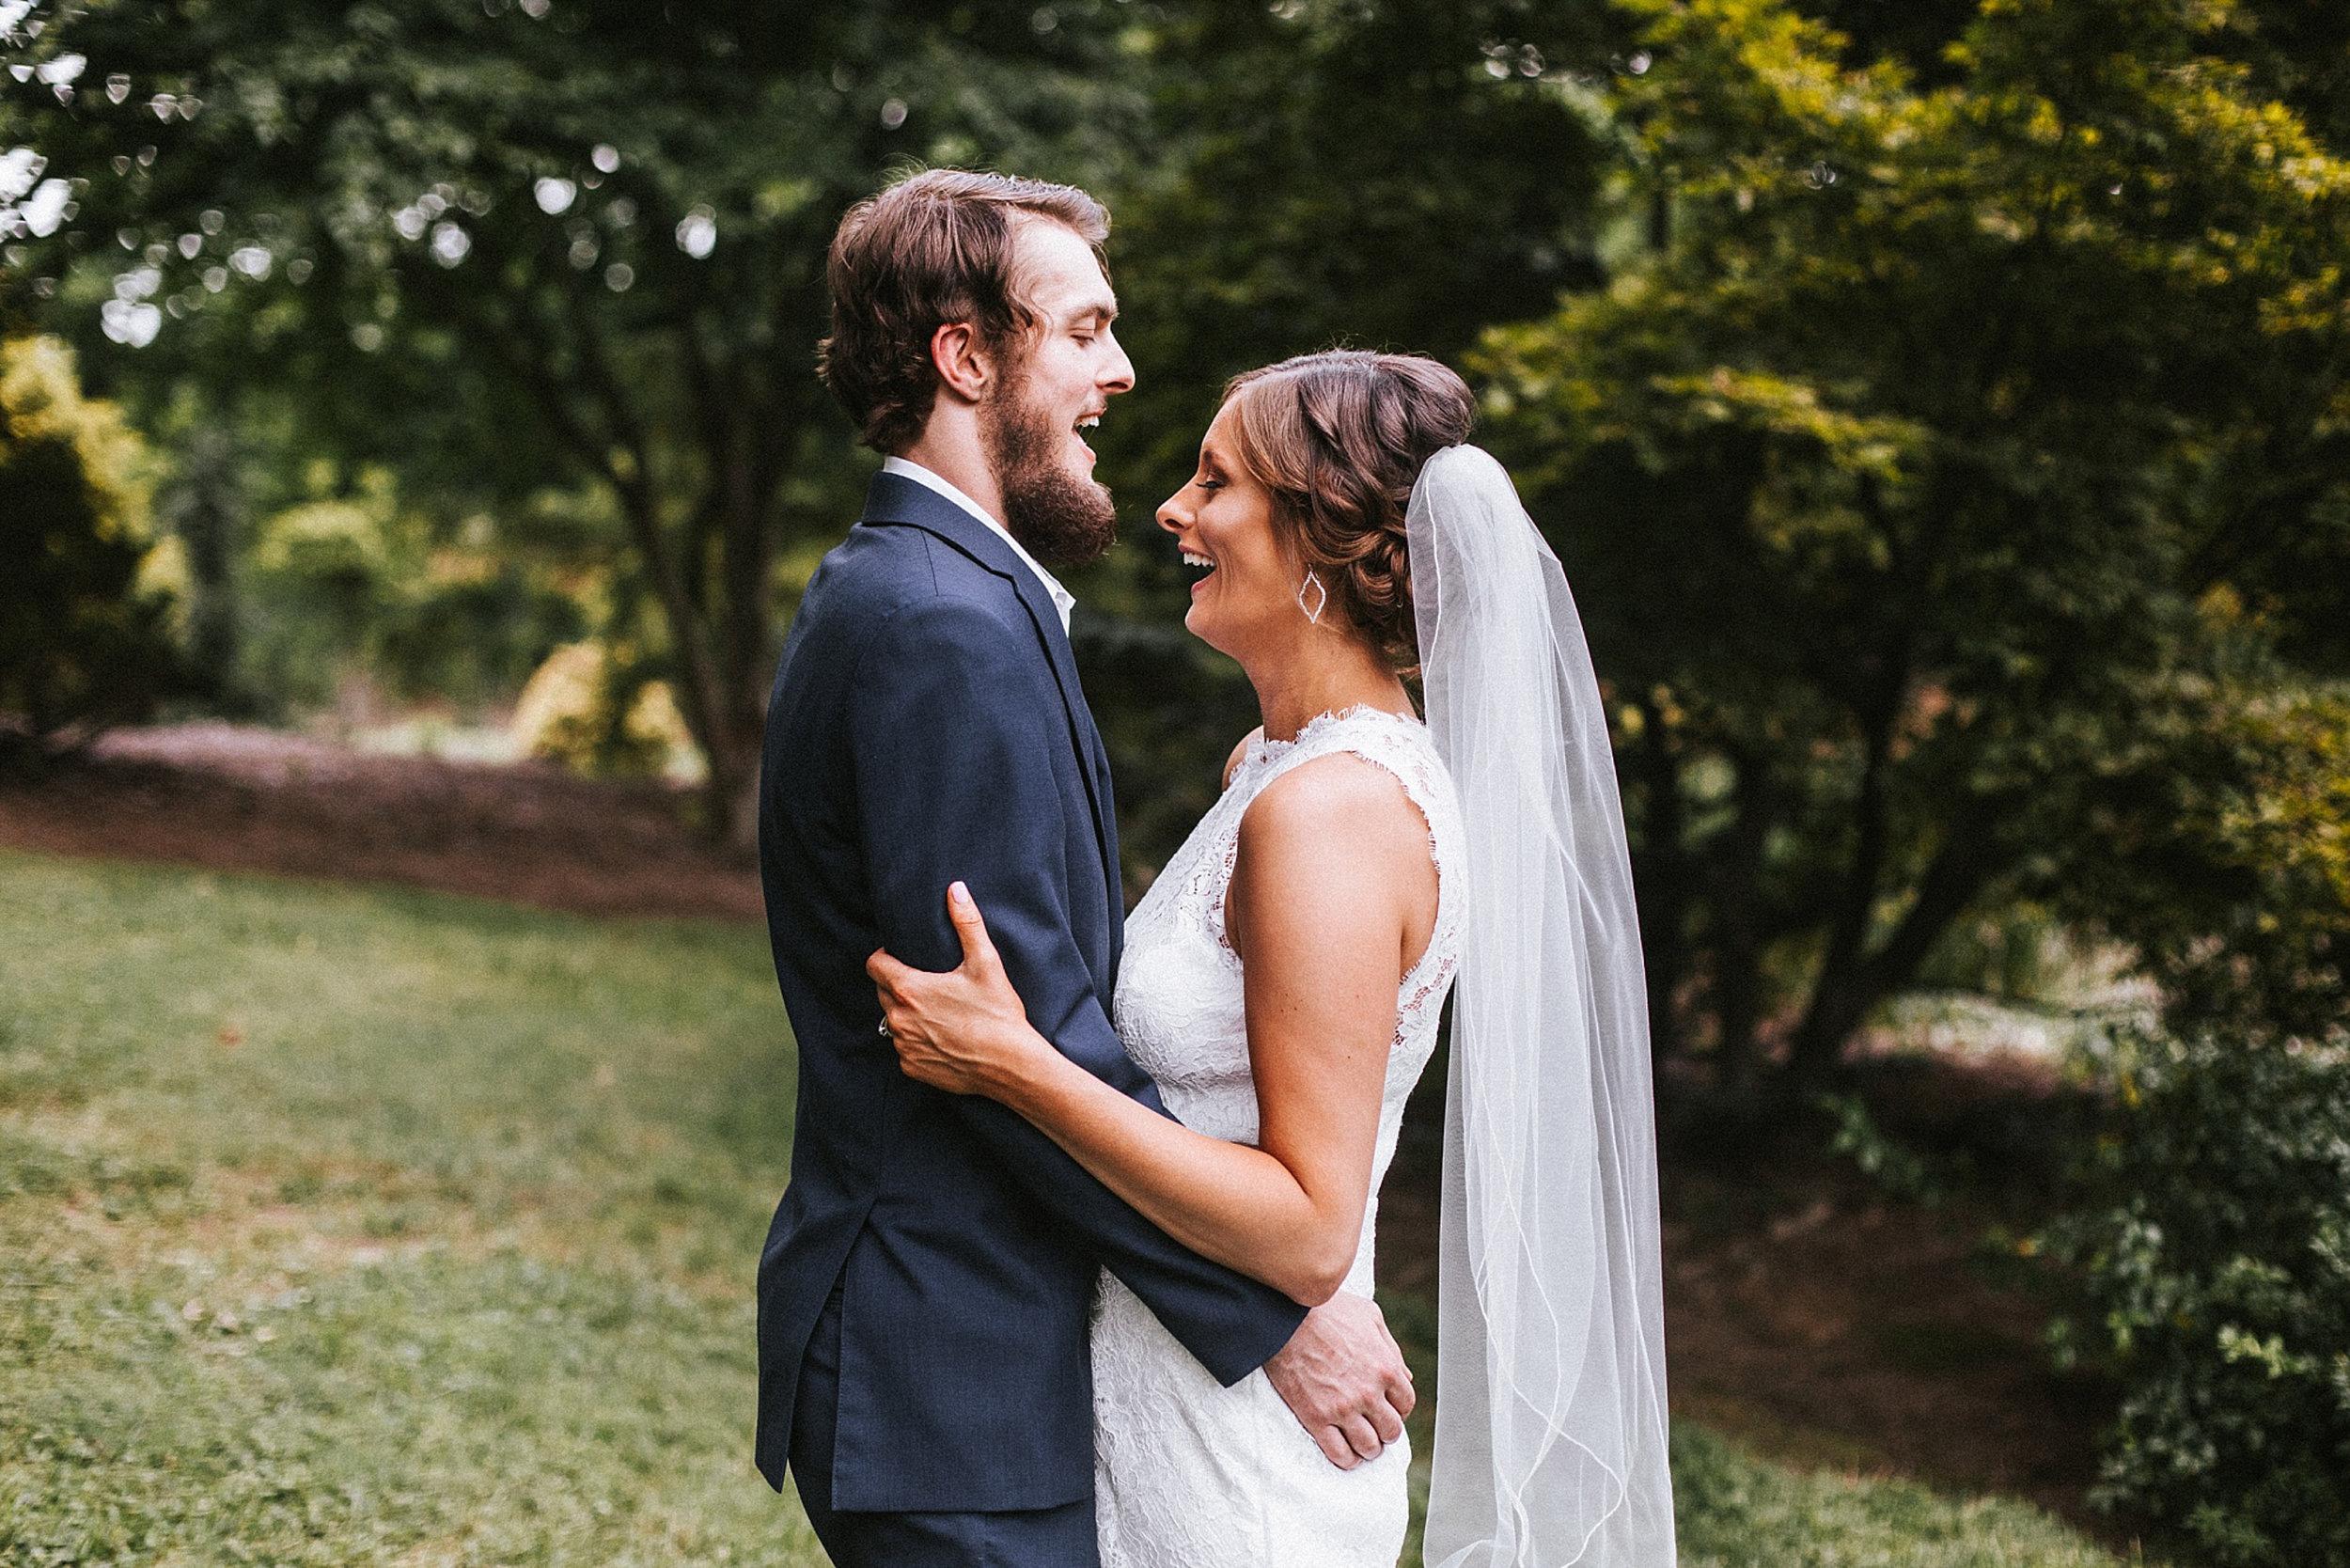 Brooke Townsend Photography - Ohio Wedding Photographer (25 of 78).jpg